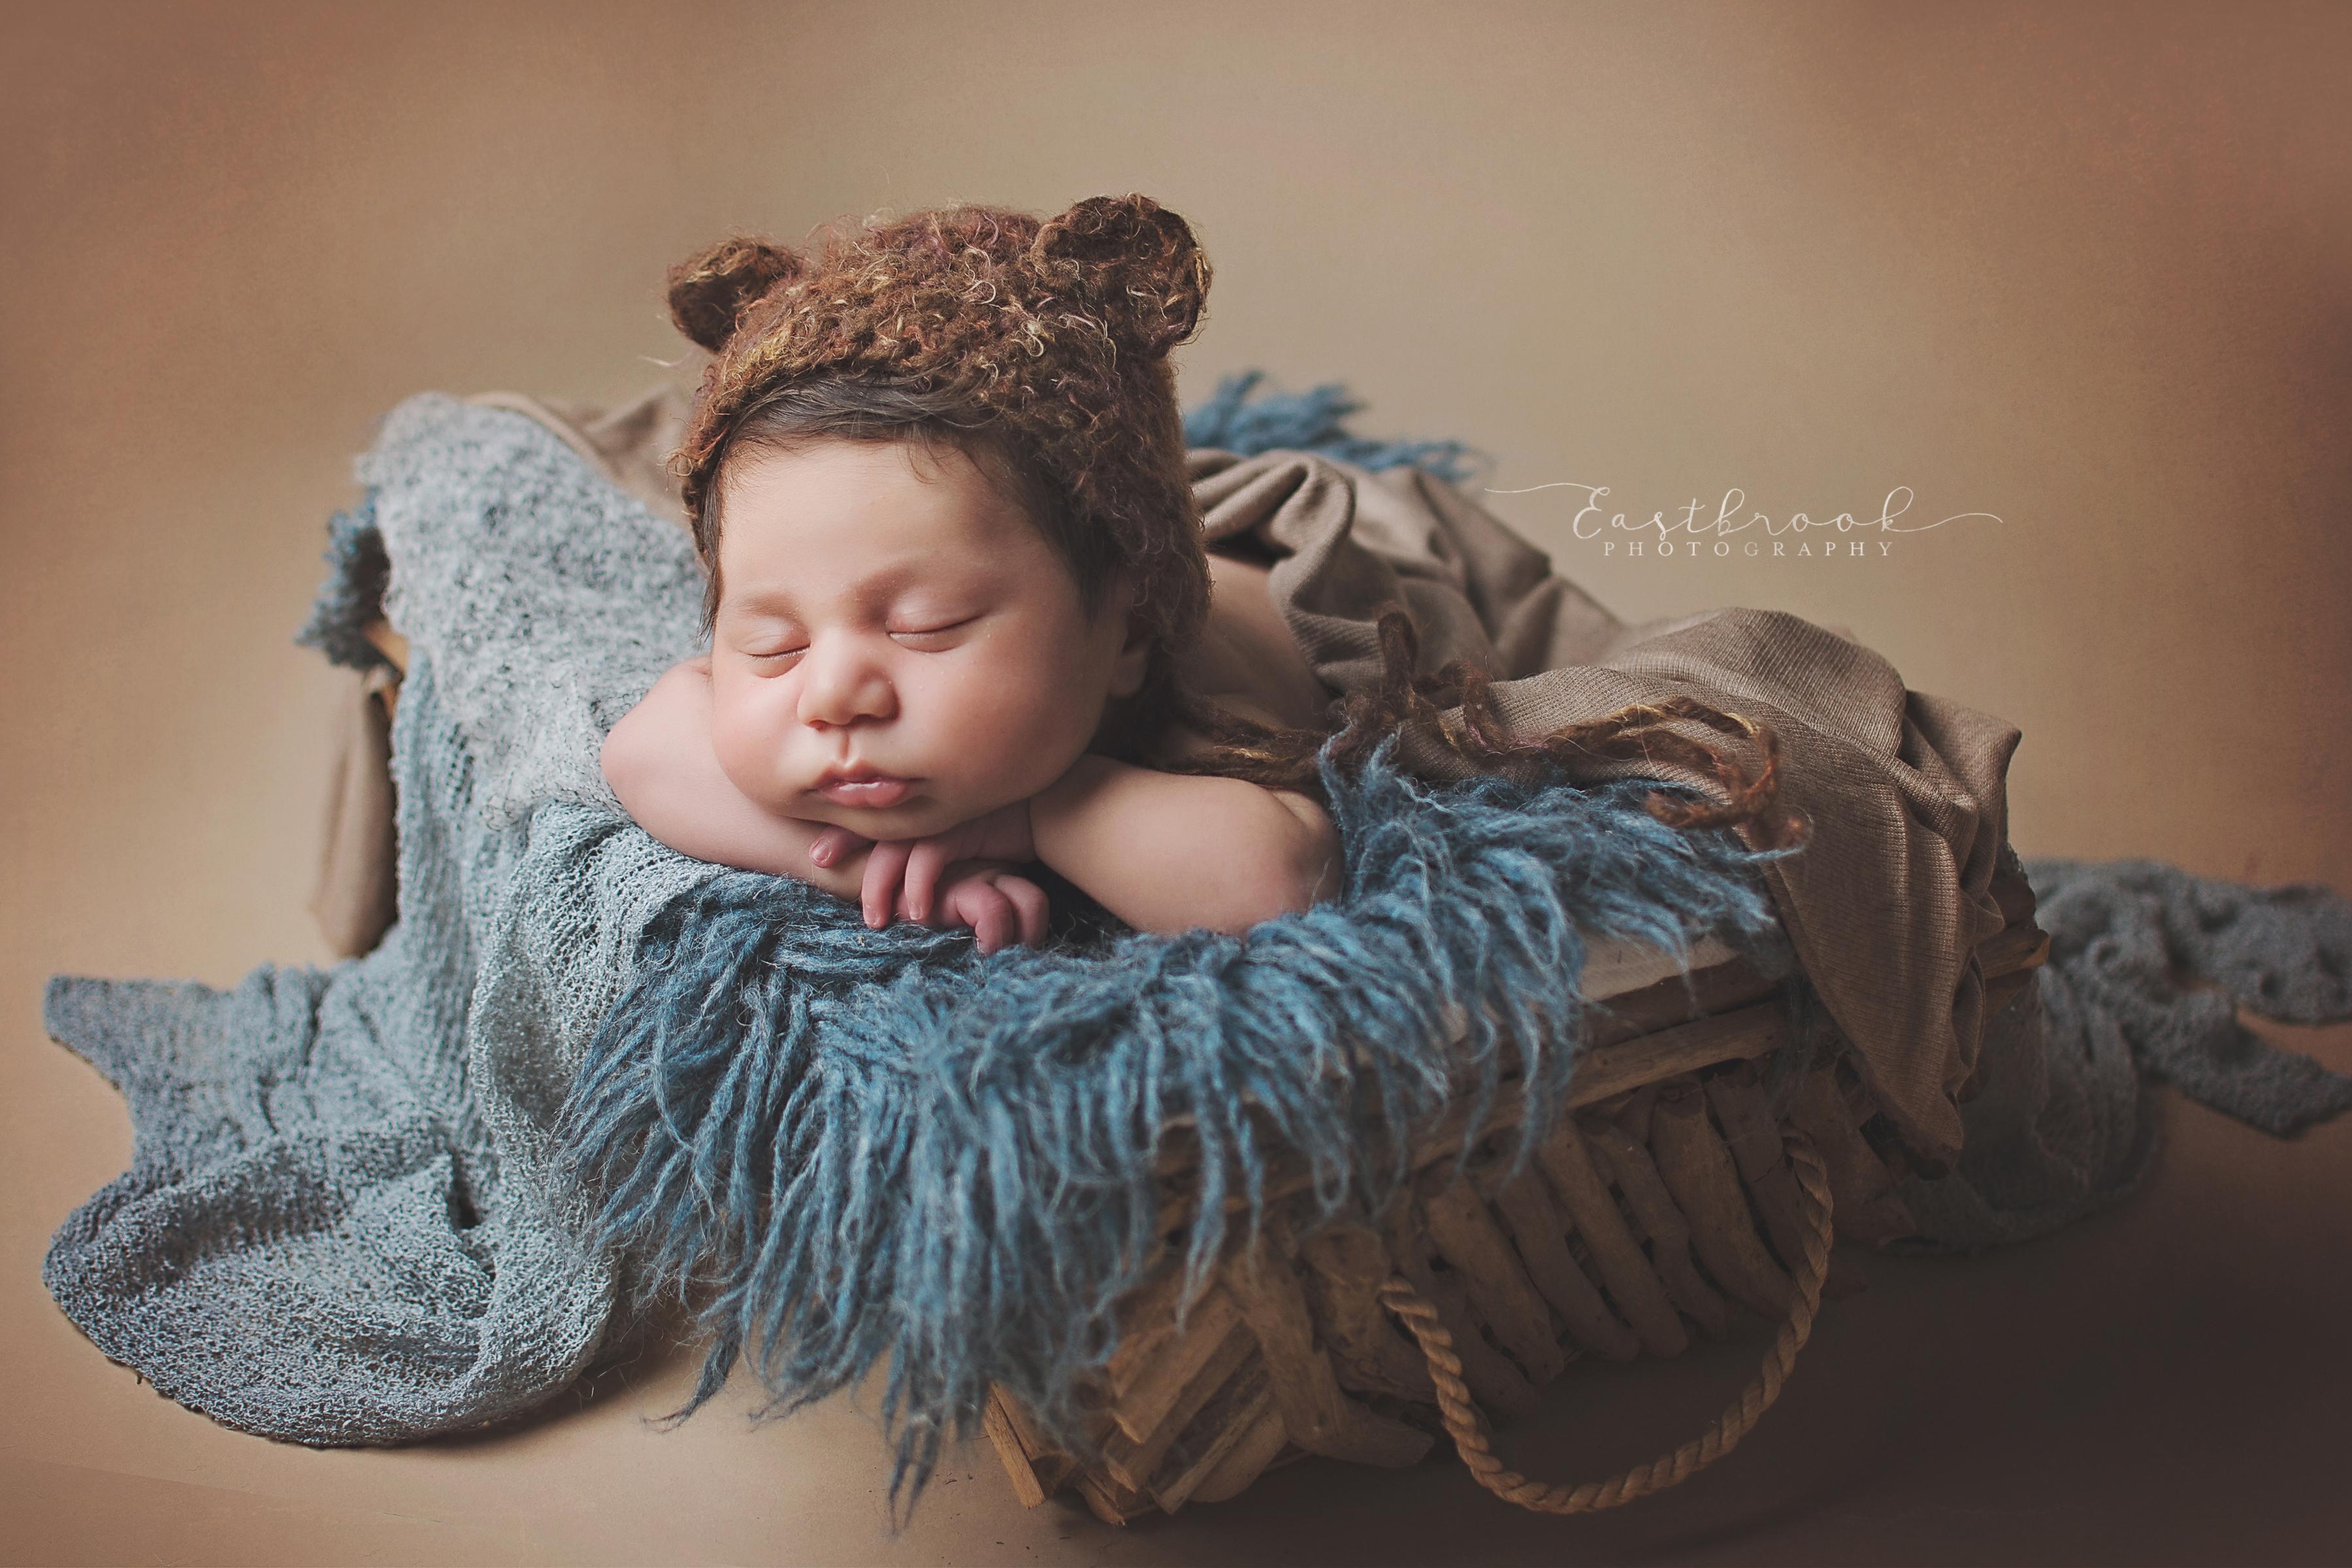 newbornphotography-santino1